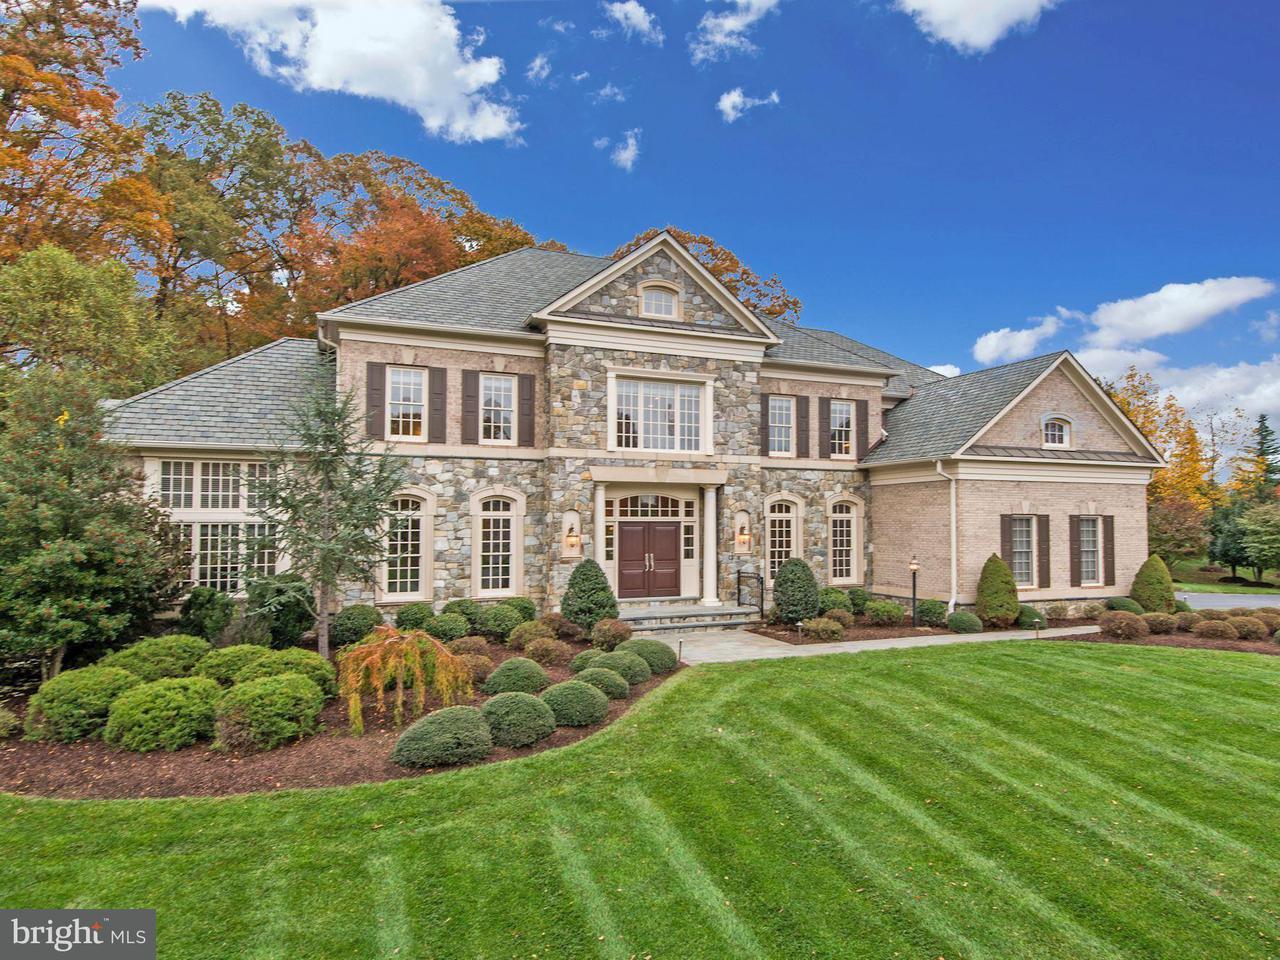 Single Family Home for Sale at 851 Nicholas Run Drive 851 Nicholas Run Drive Great Falls, Virginia 22066 United States